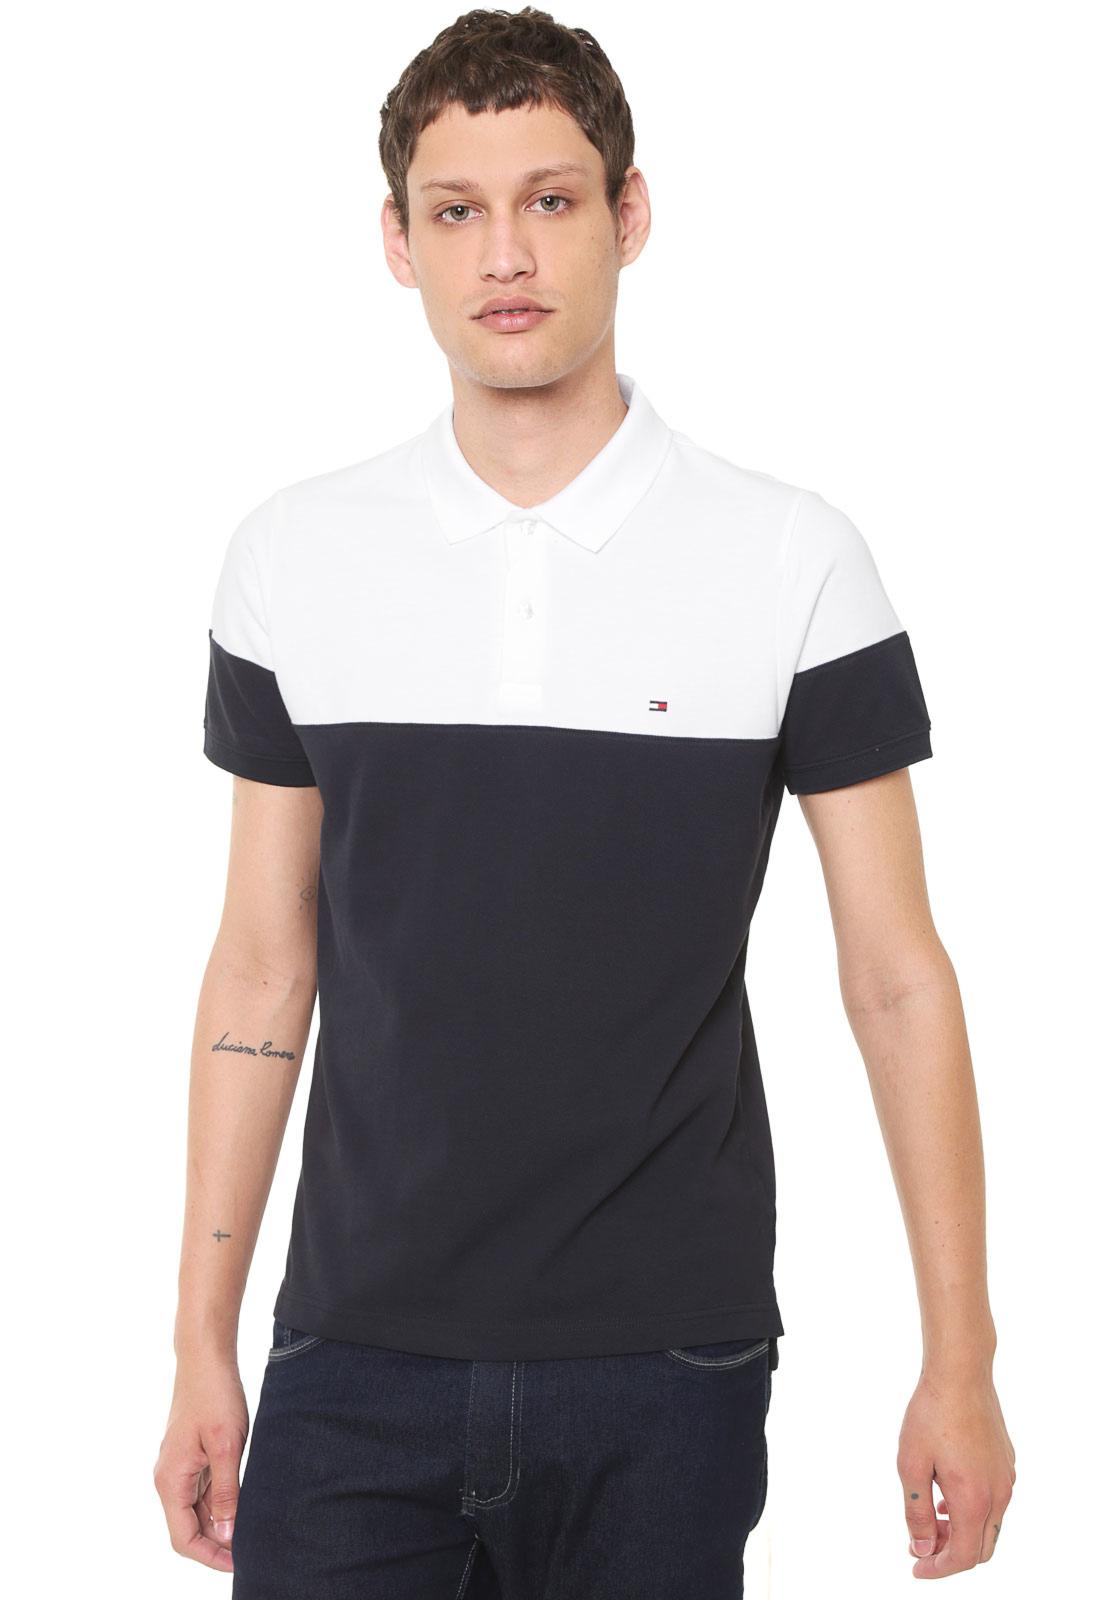 Kit 5 Camisas Polo Camisetas Masculinas Top Qualidade